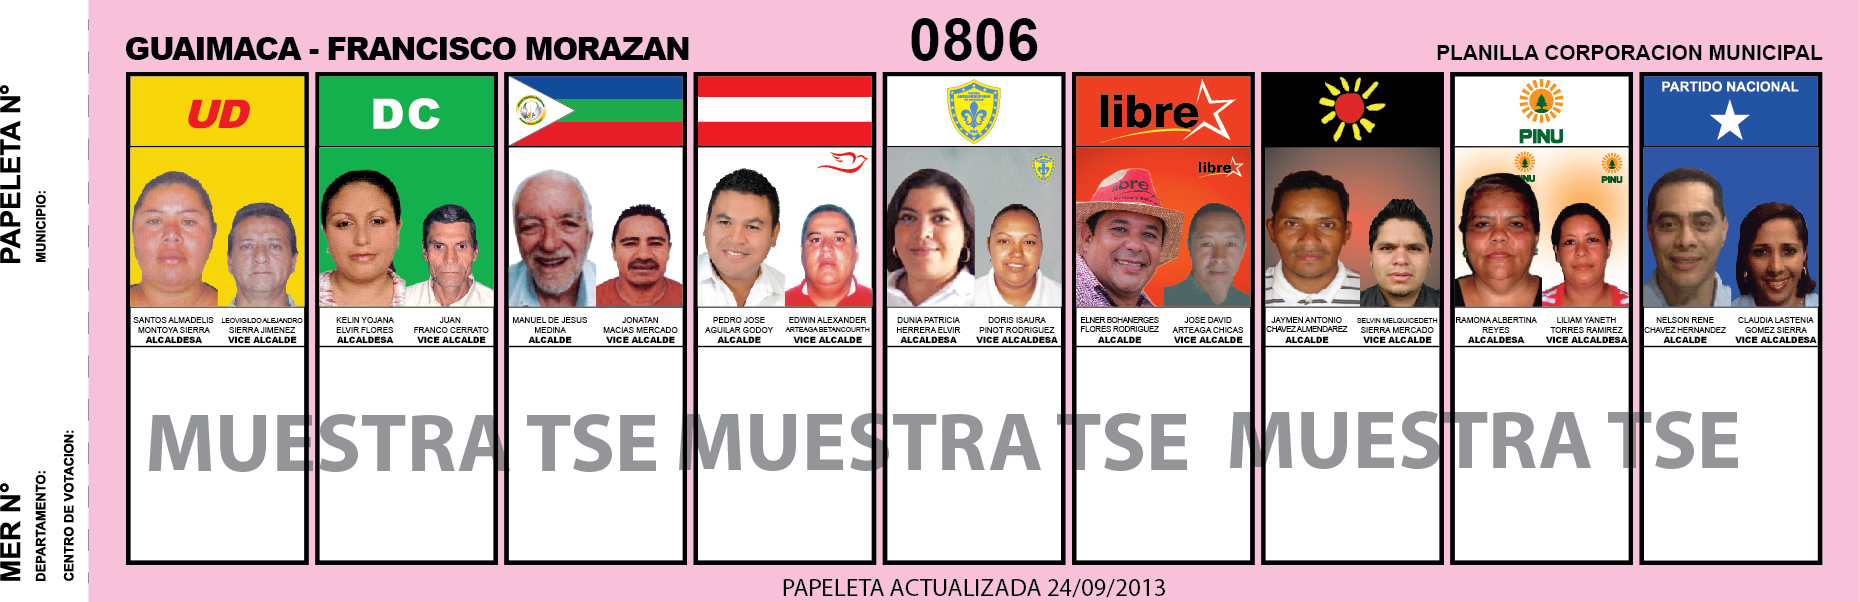 CANDIDATOS 2013 MUNICIPIO GUAIMACA - FRANCISCO MORAZAN - HONDURAS